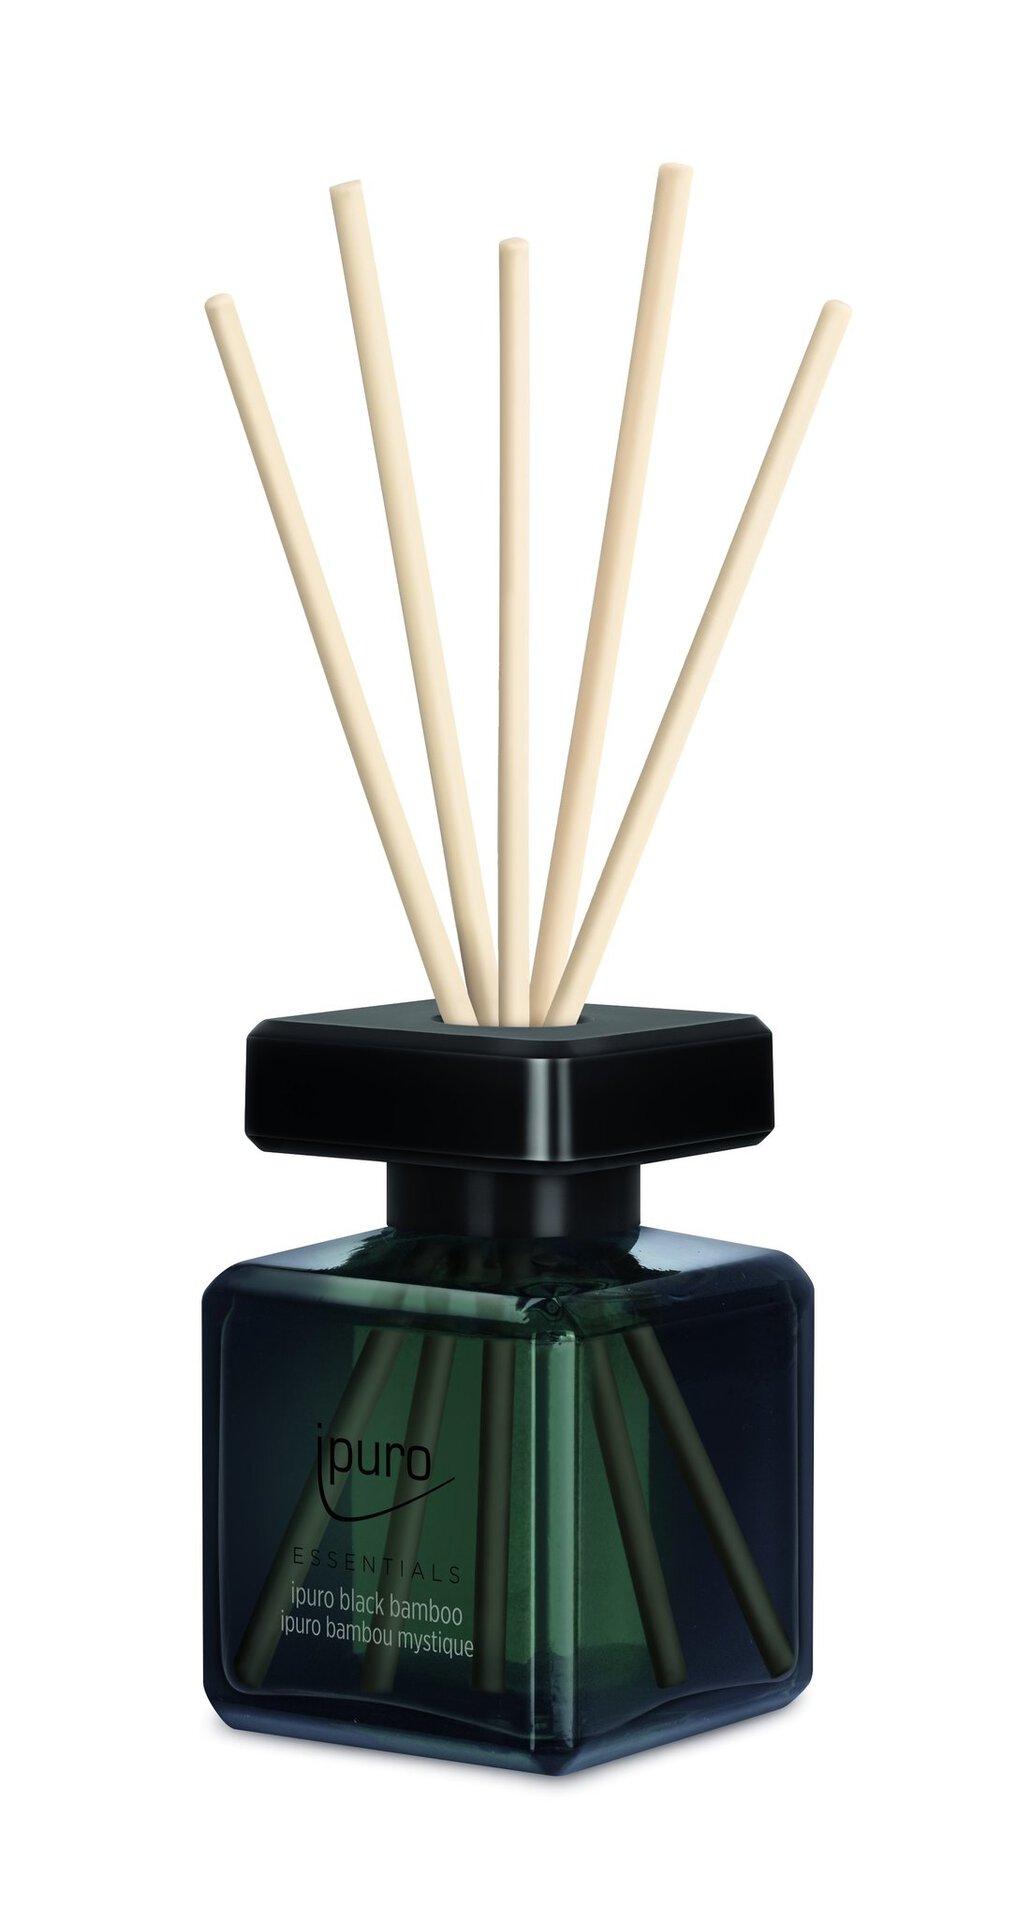 Raumduft black bamboo ipuro Kunststoff